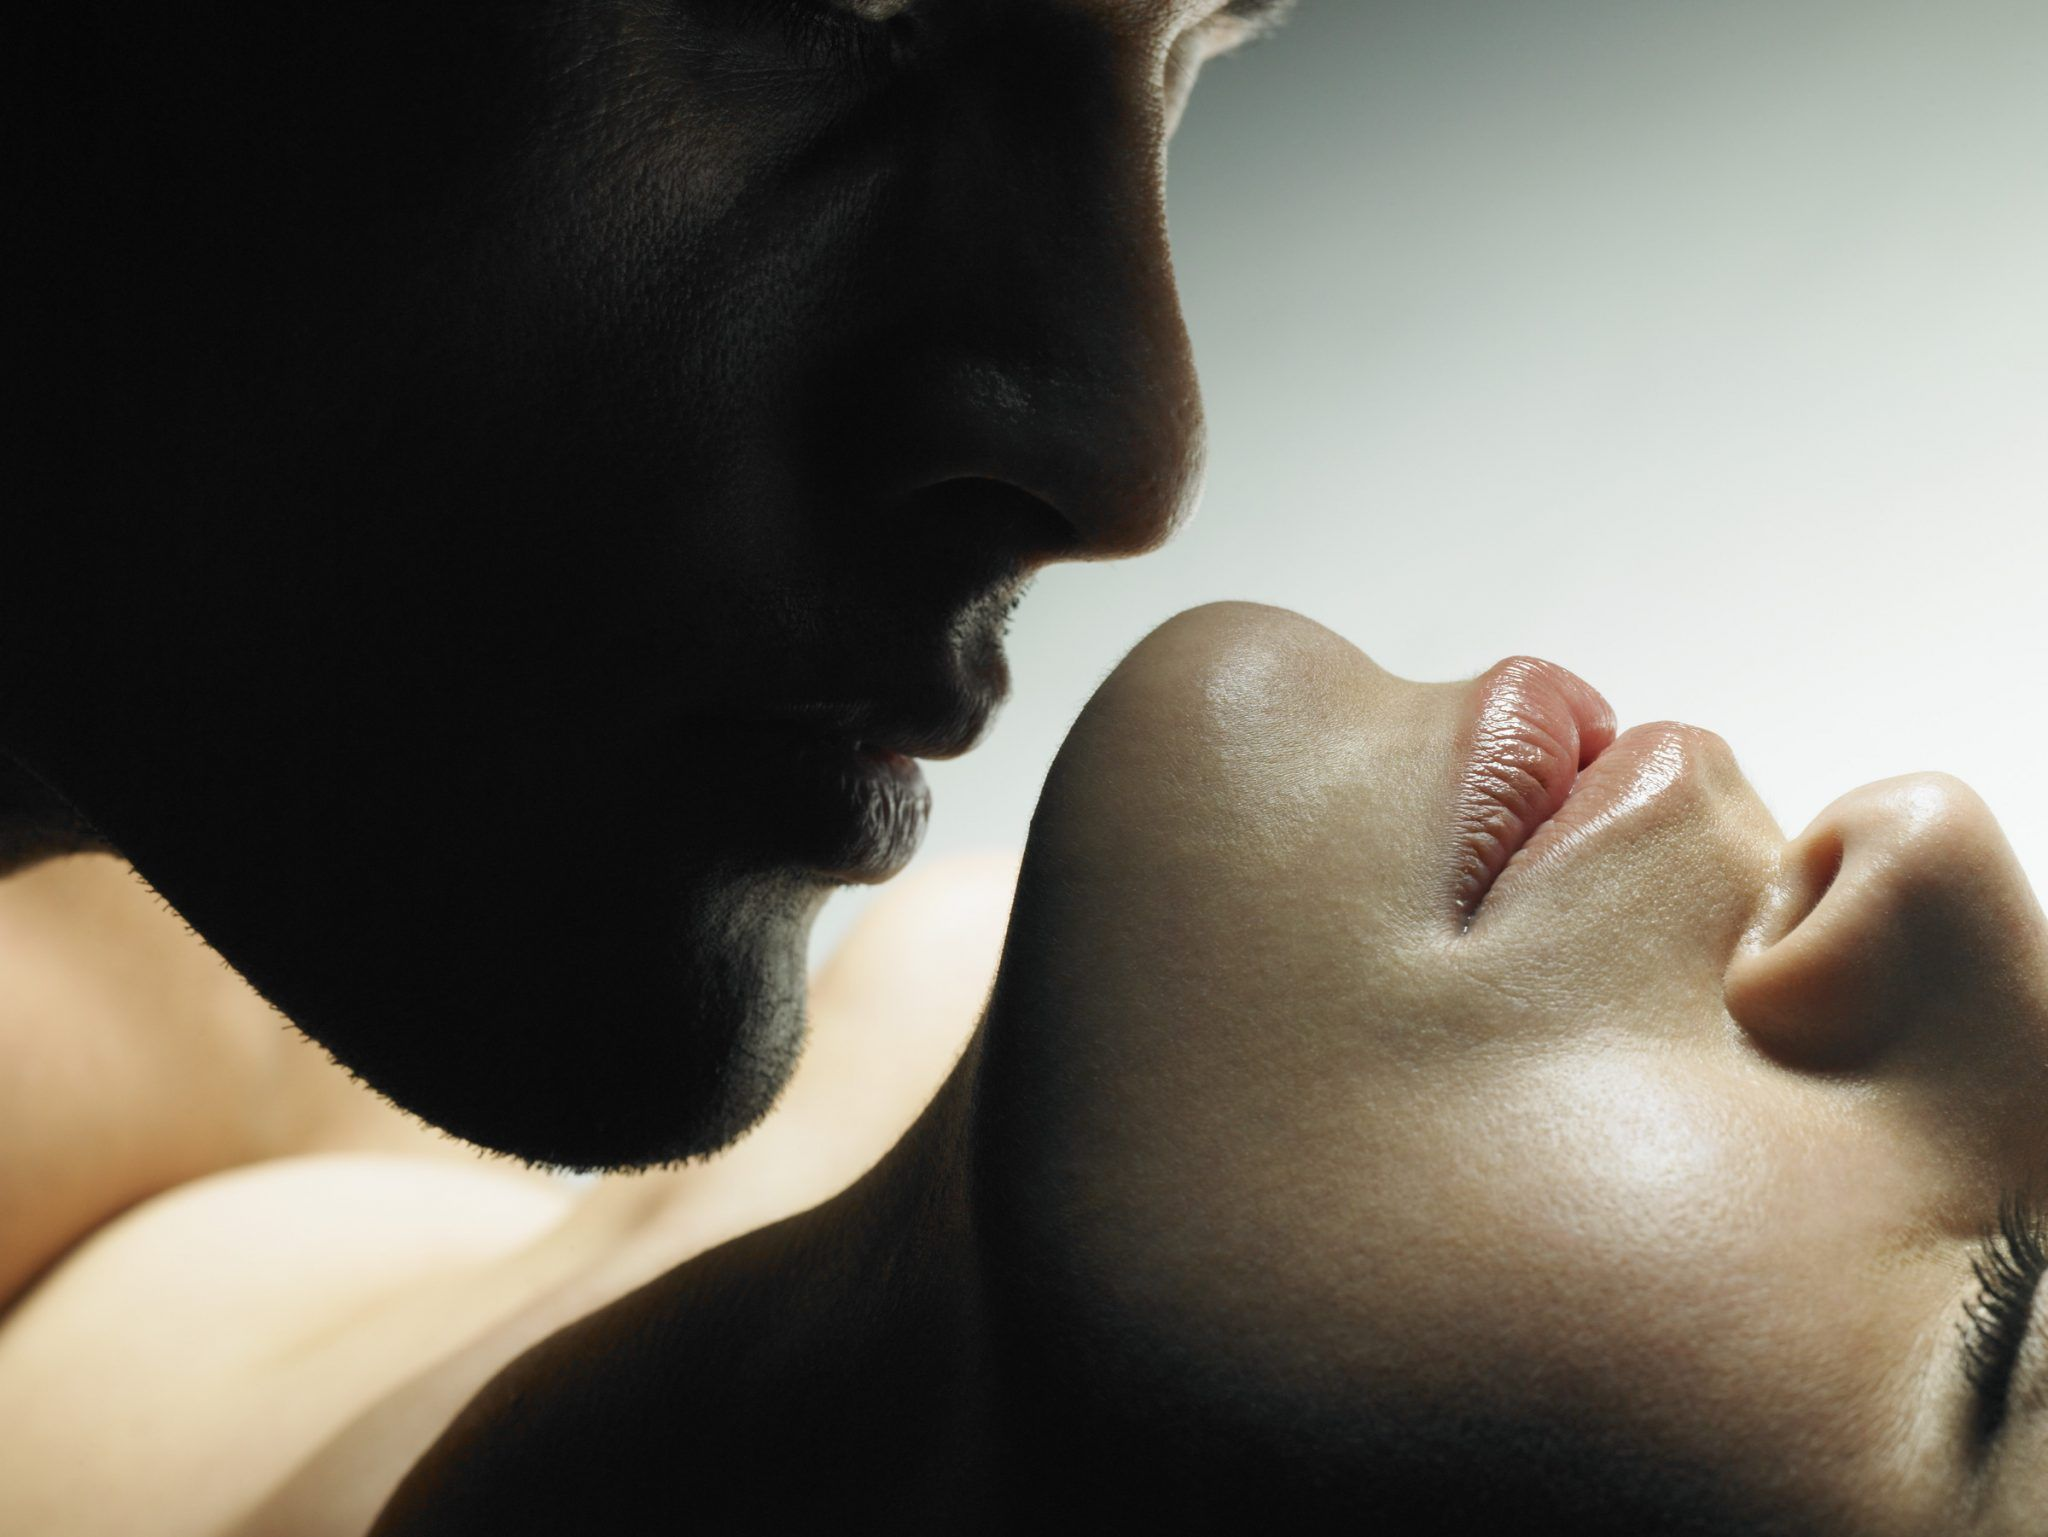 Возбуждающие поцелуи картинки — photo 8